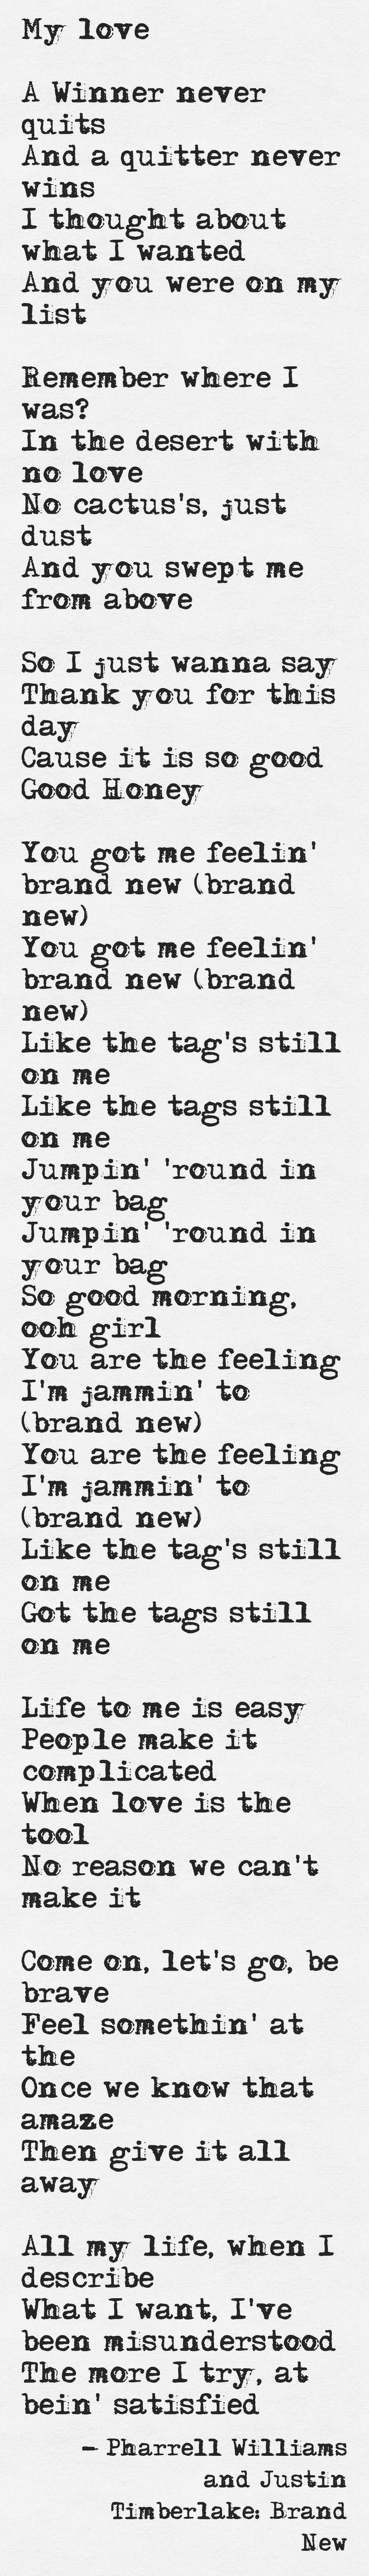 happy pharrell williams lyrics español